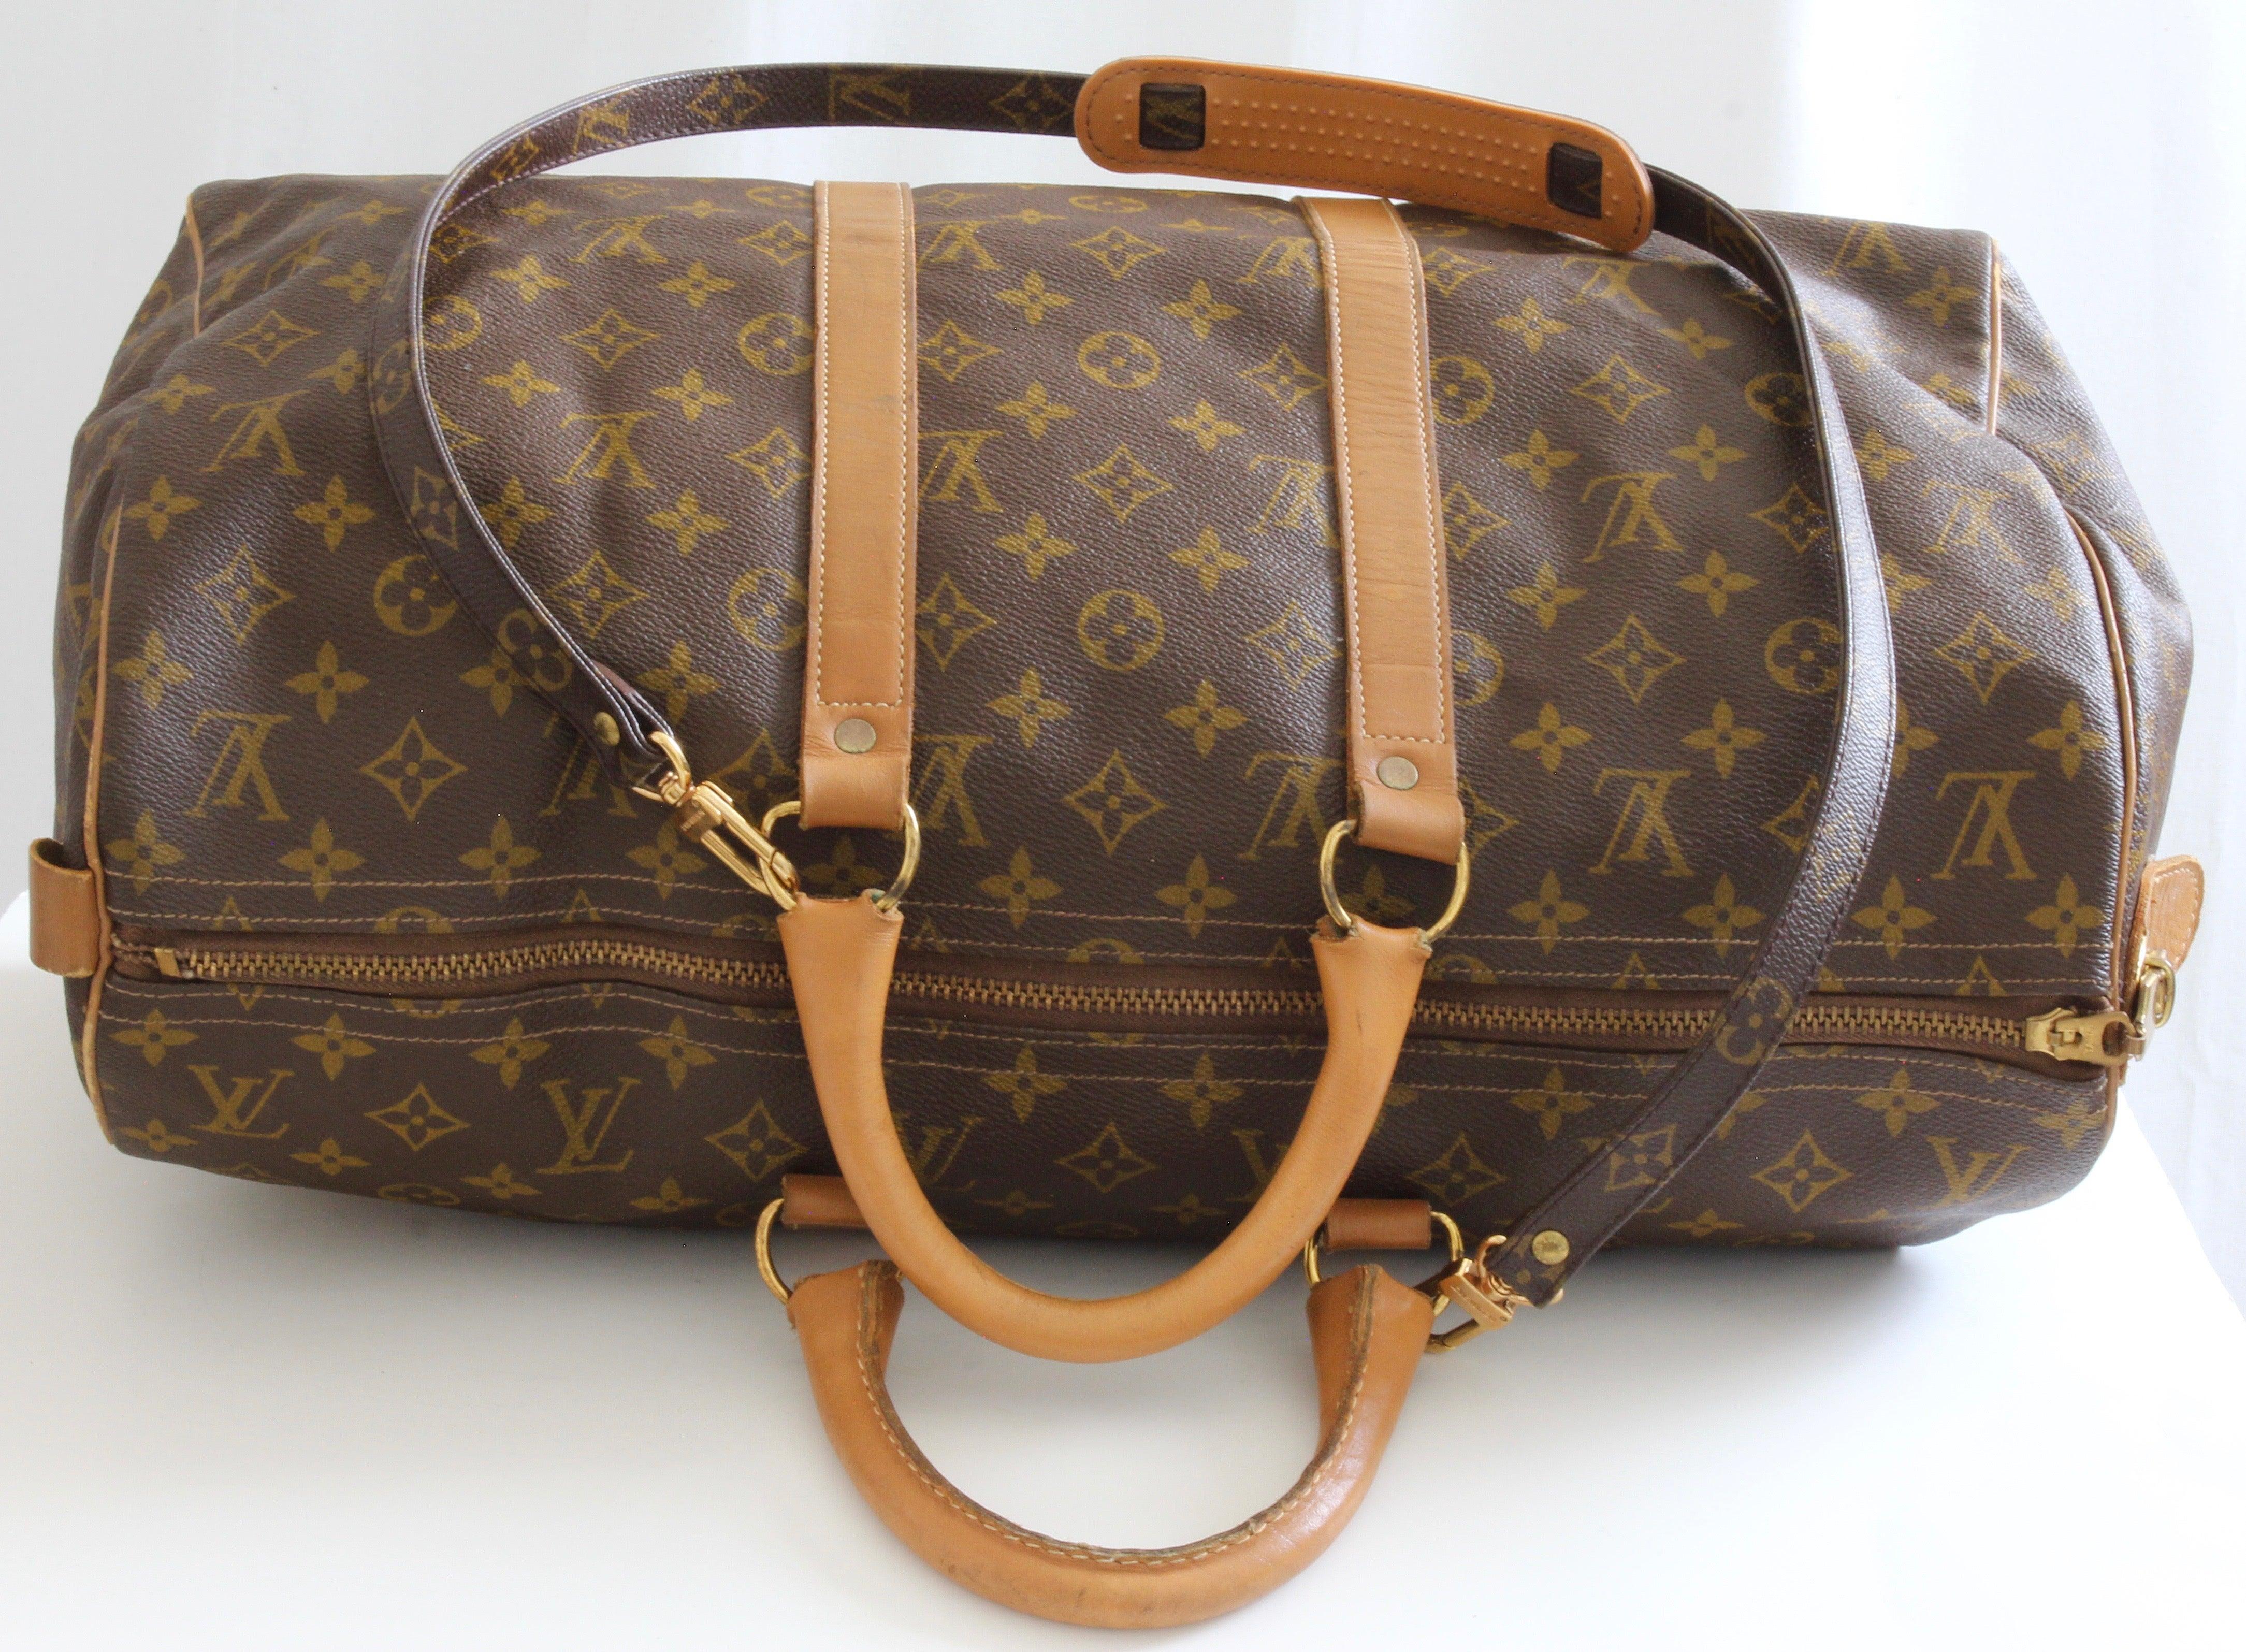 4047396b0a25 Louis Vuitton Keepall Duffle Bag 45cm Travel French Company